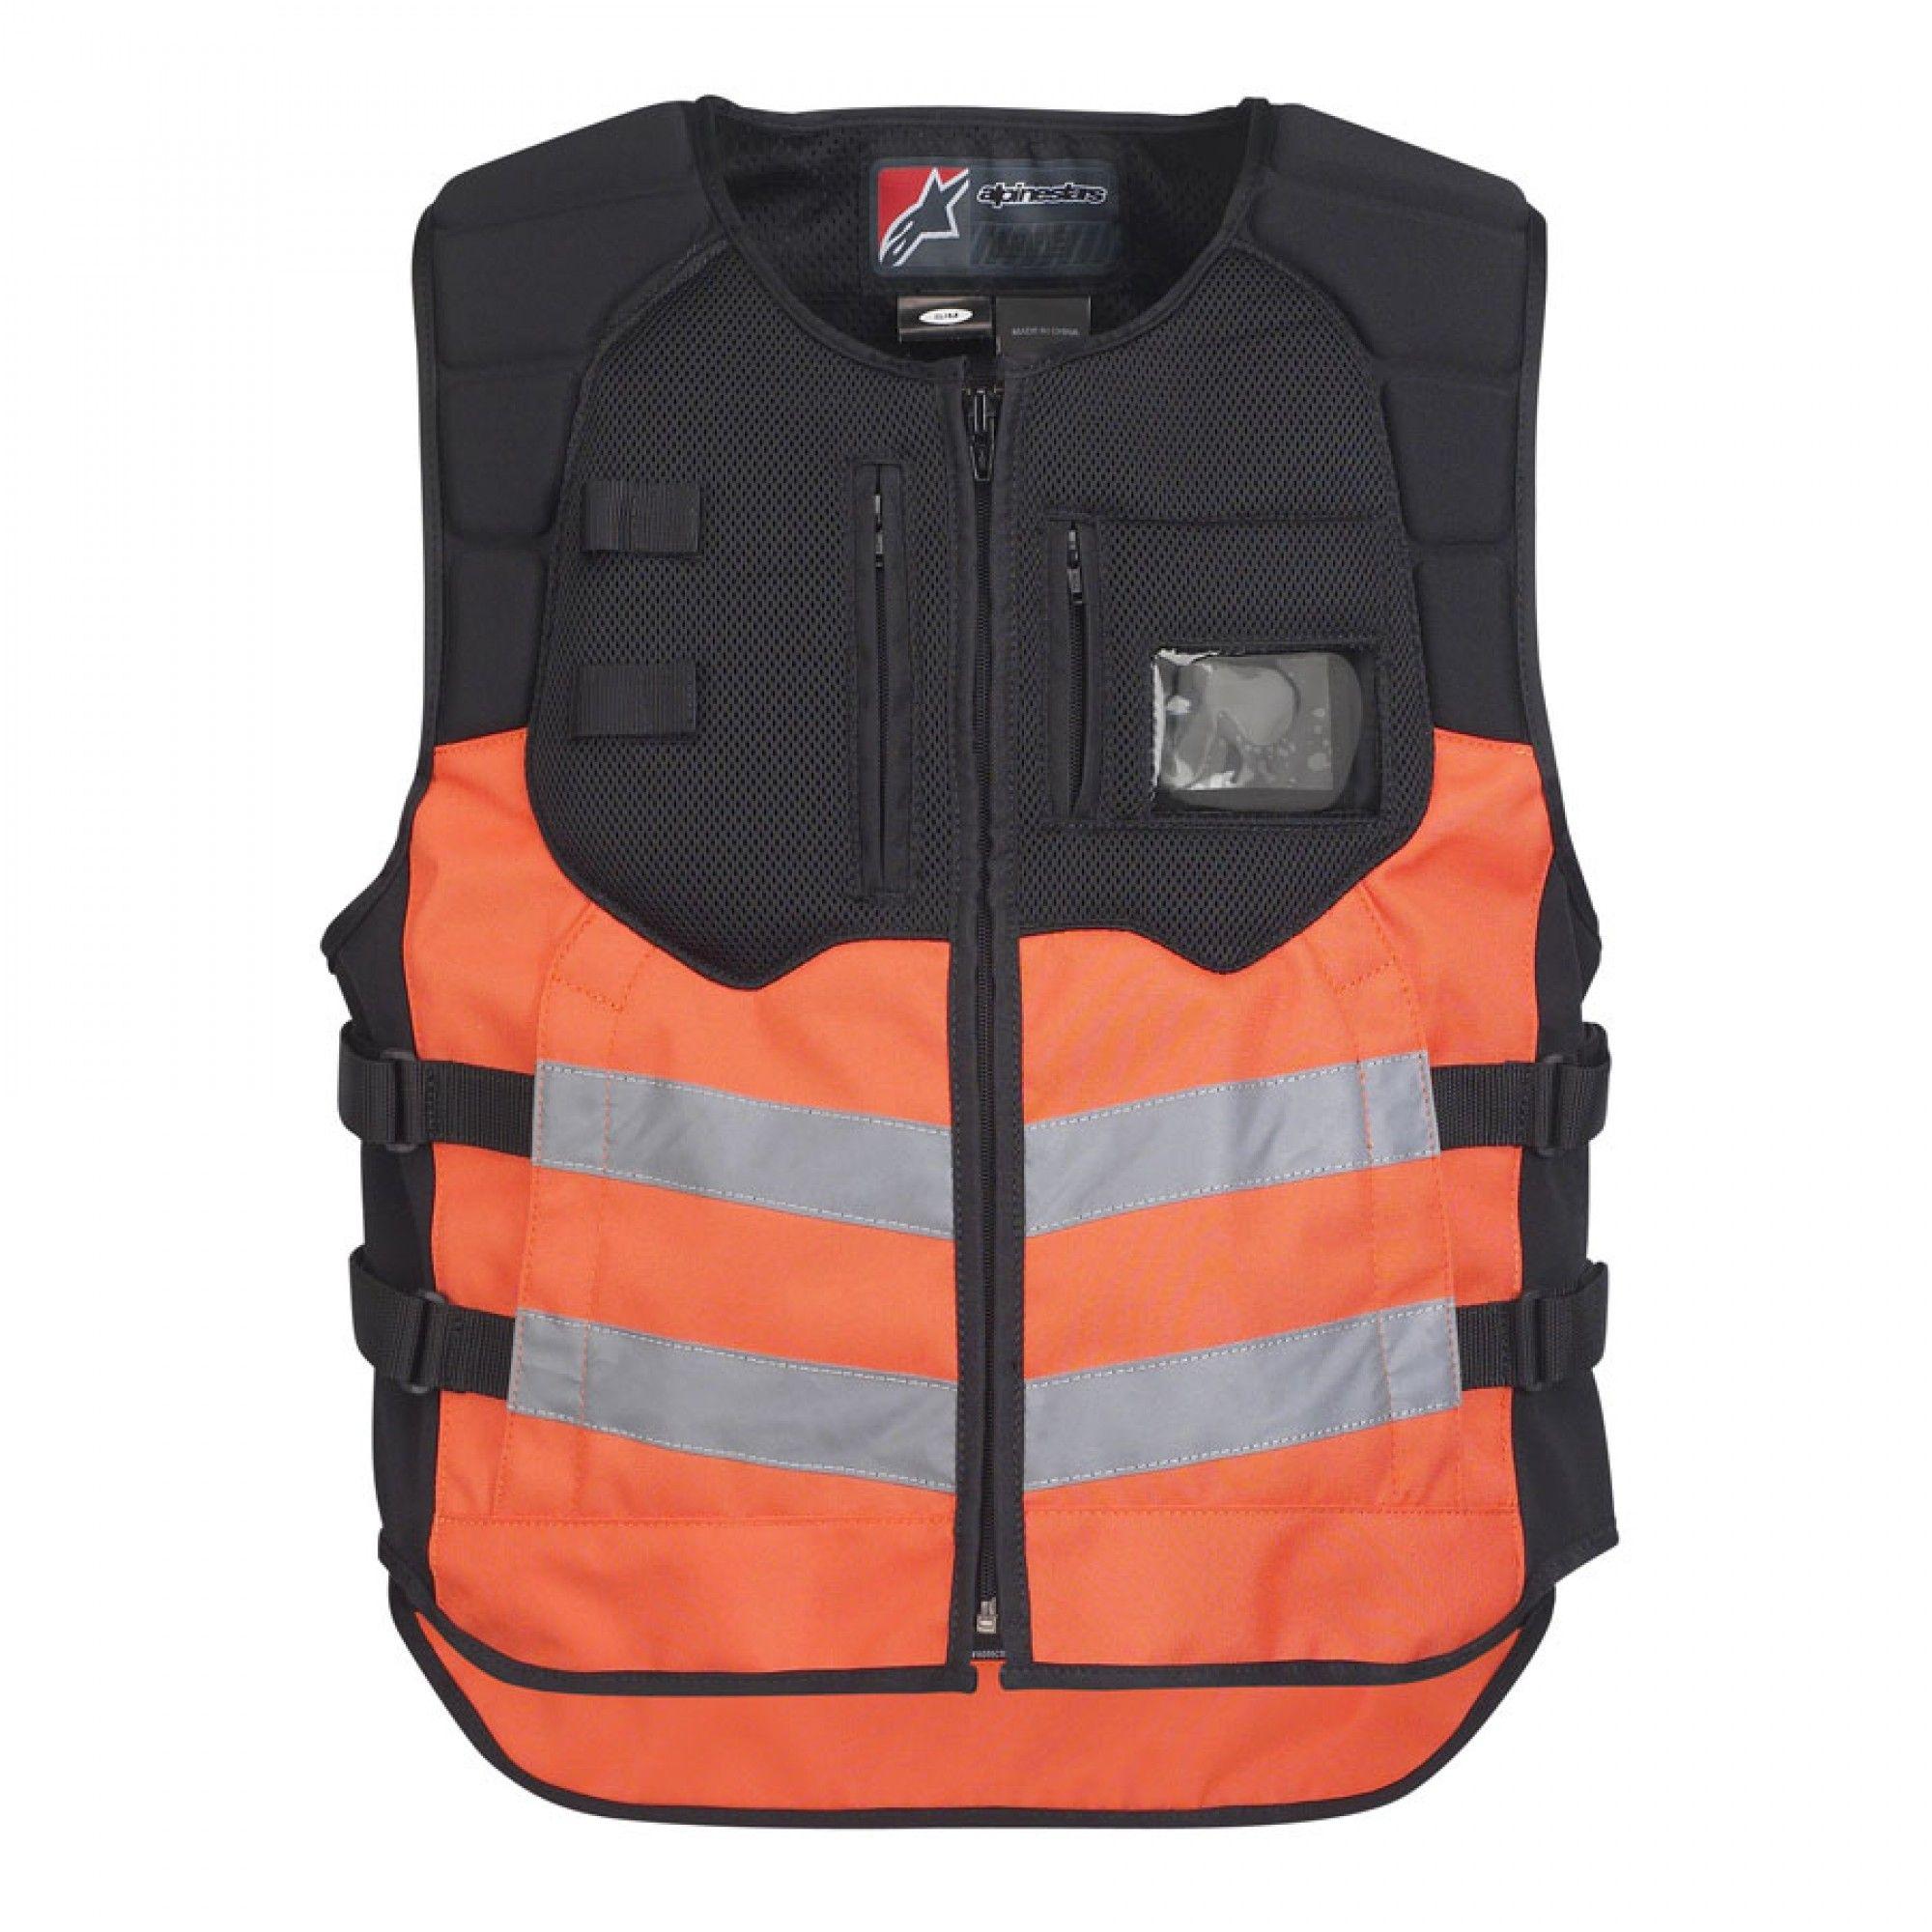 Alpinestars Stealth Protection Vest Motorcycle vest